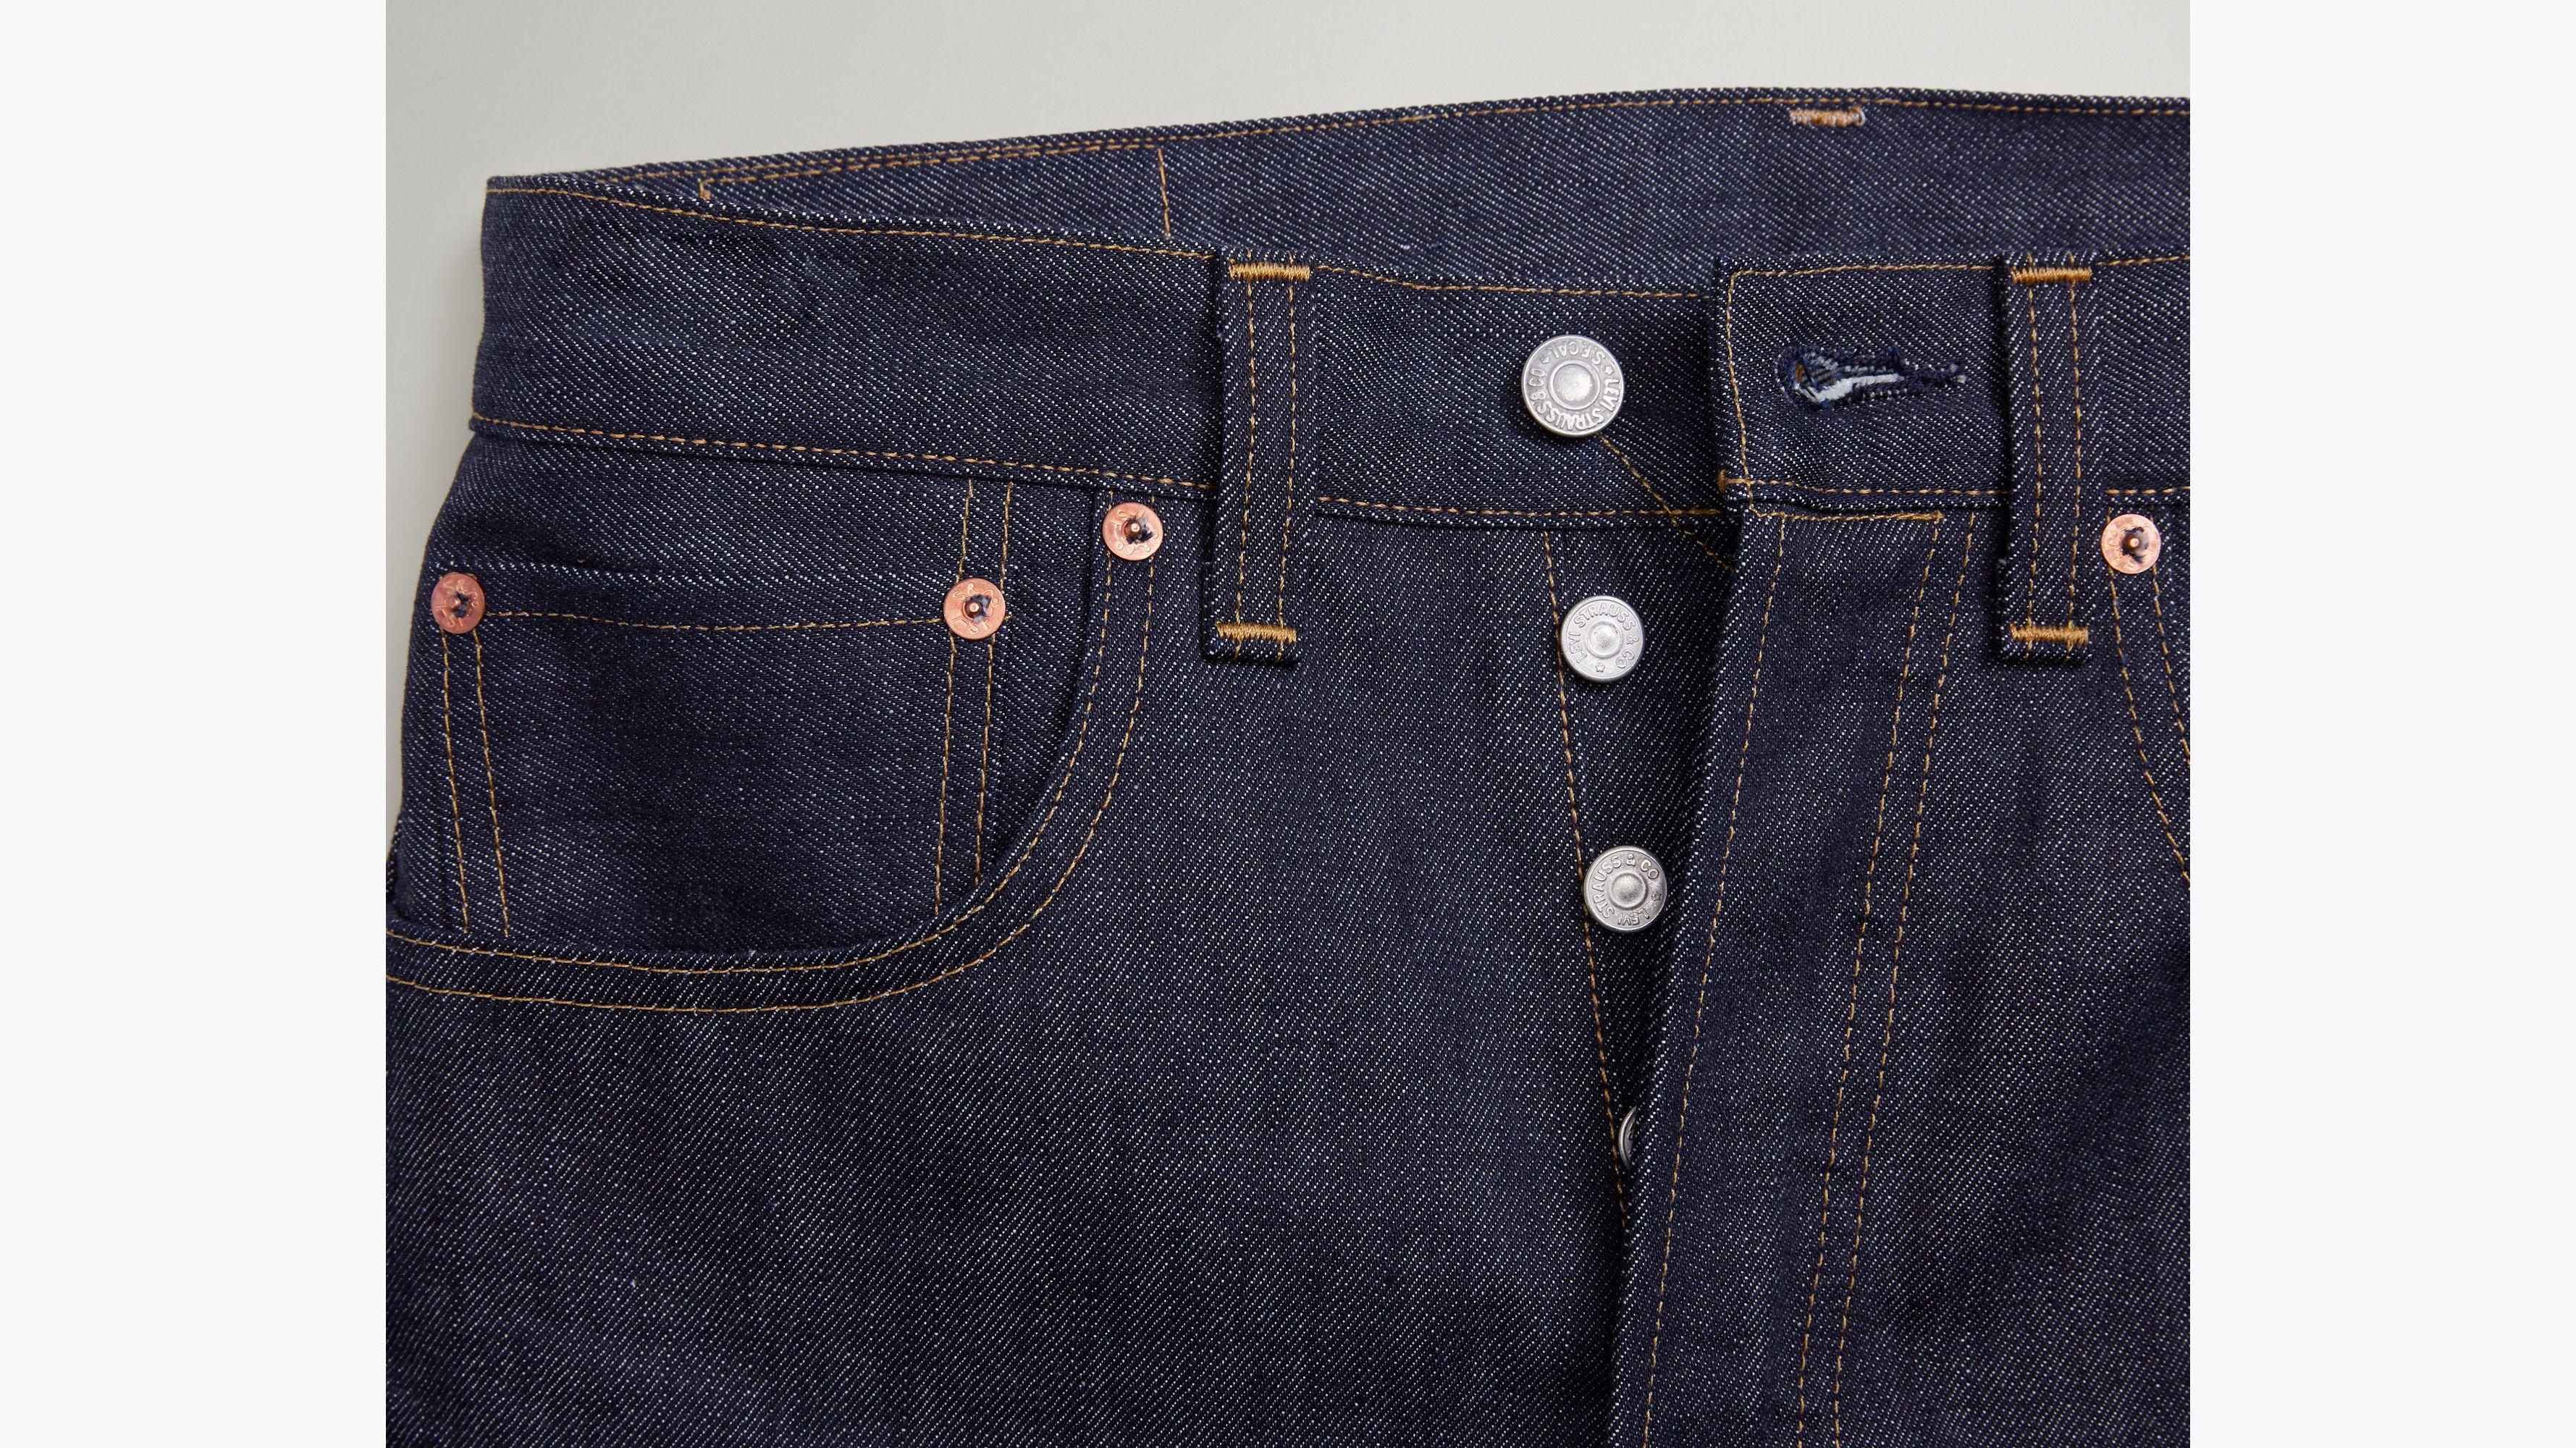 Levi's® Clothing 1947 Vintage Jeans 501® nN0P8kOZwX